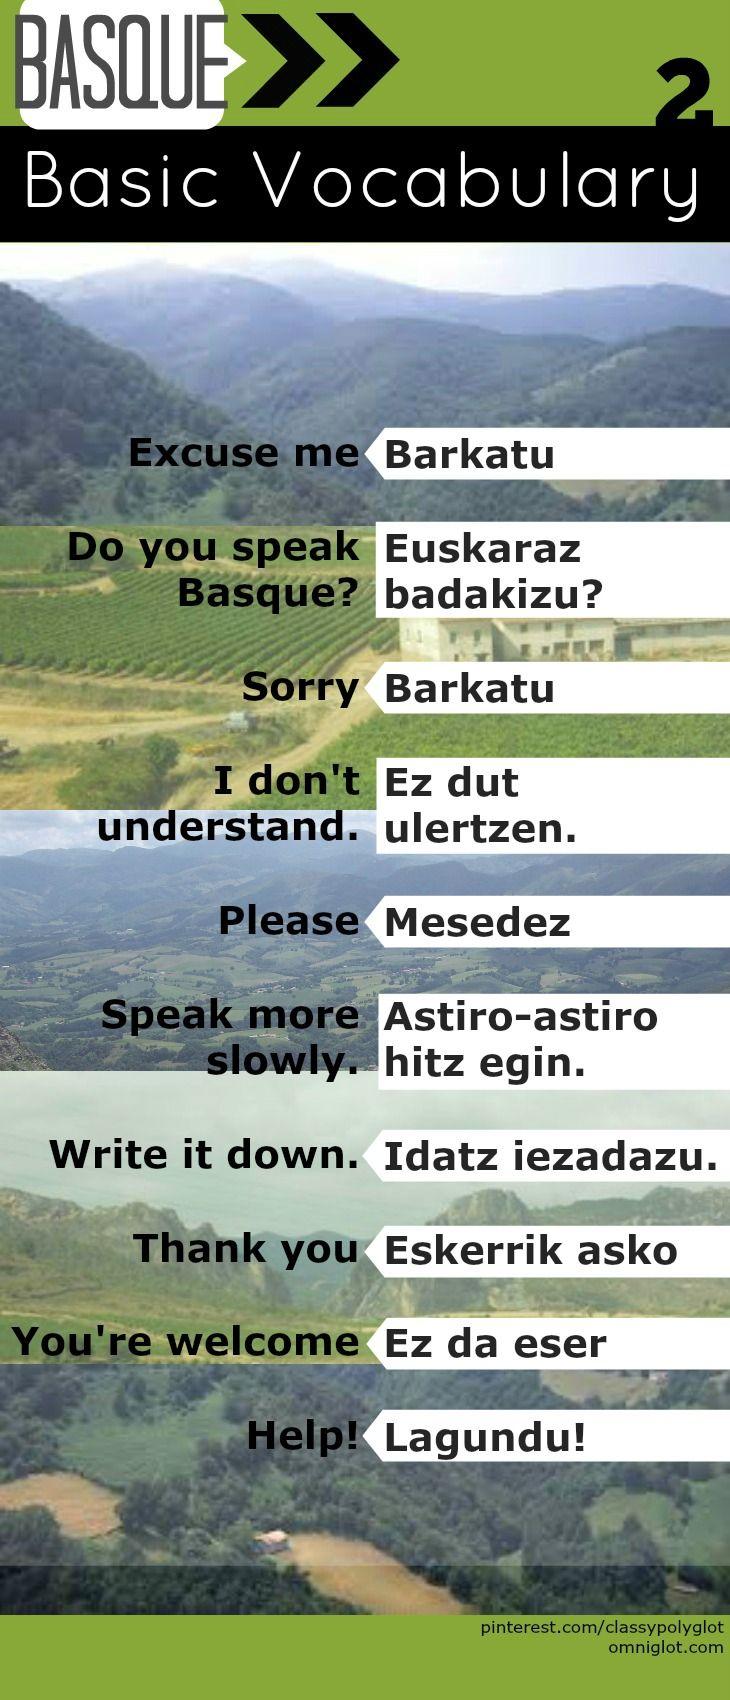 Basics | Euskara